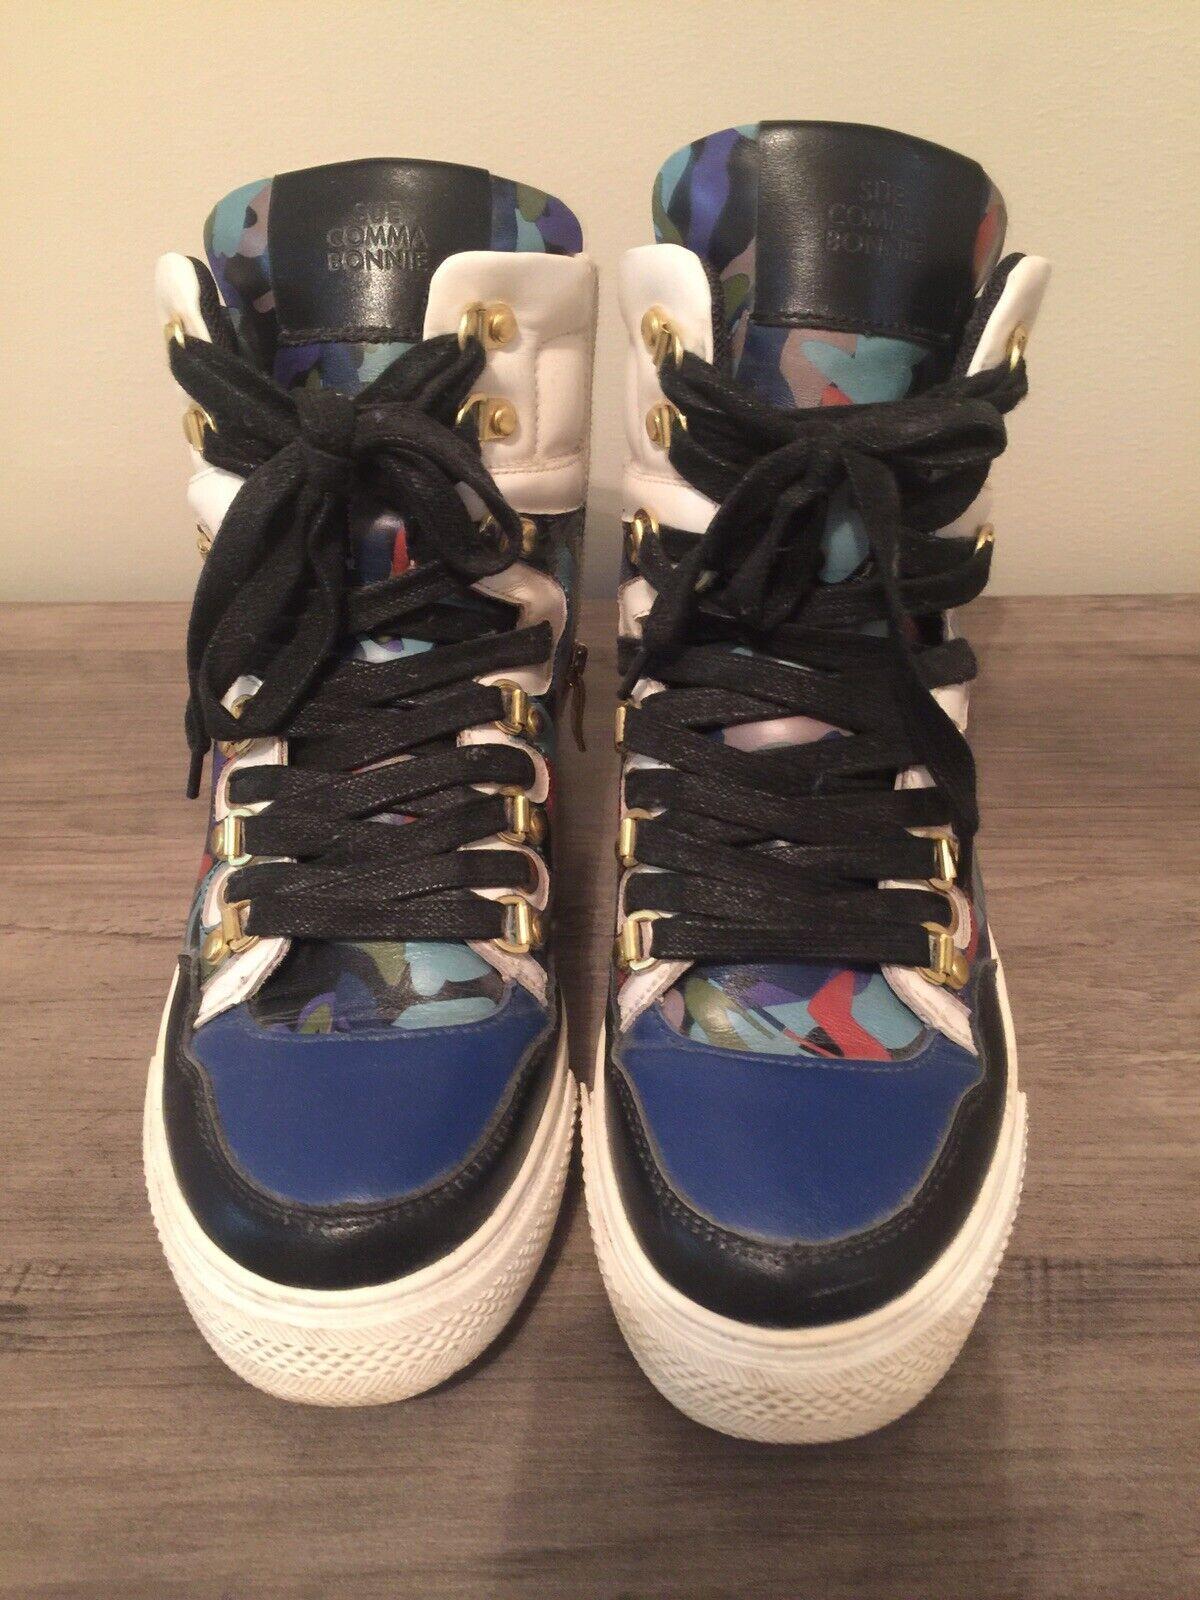 Suecomma Bonnie Sneakers Size 37